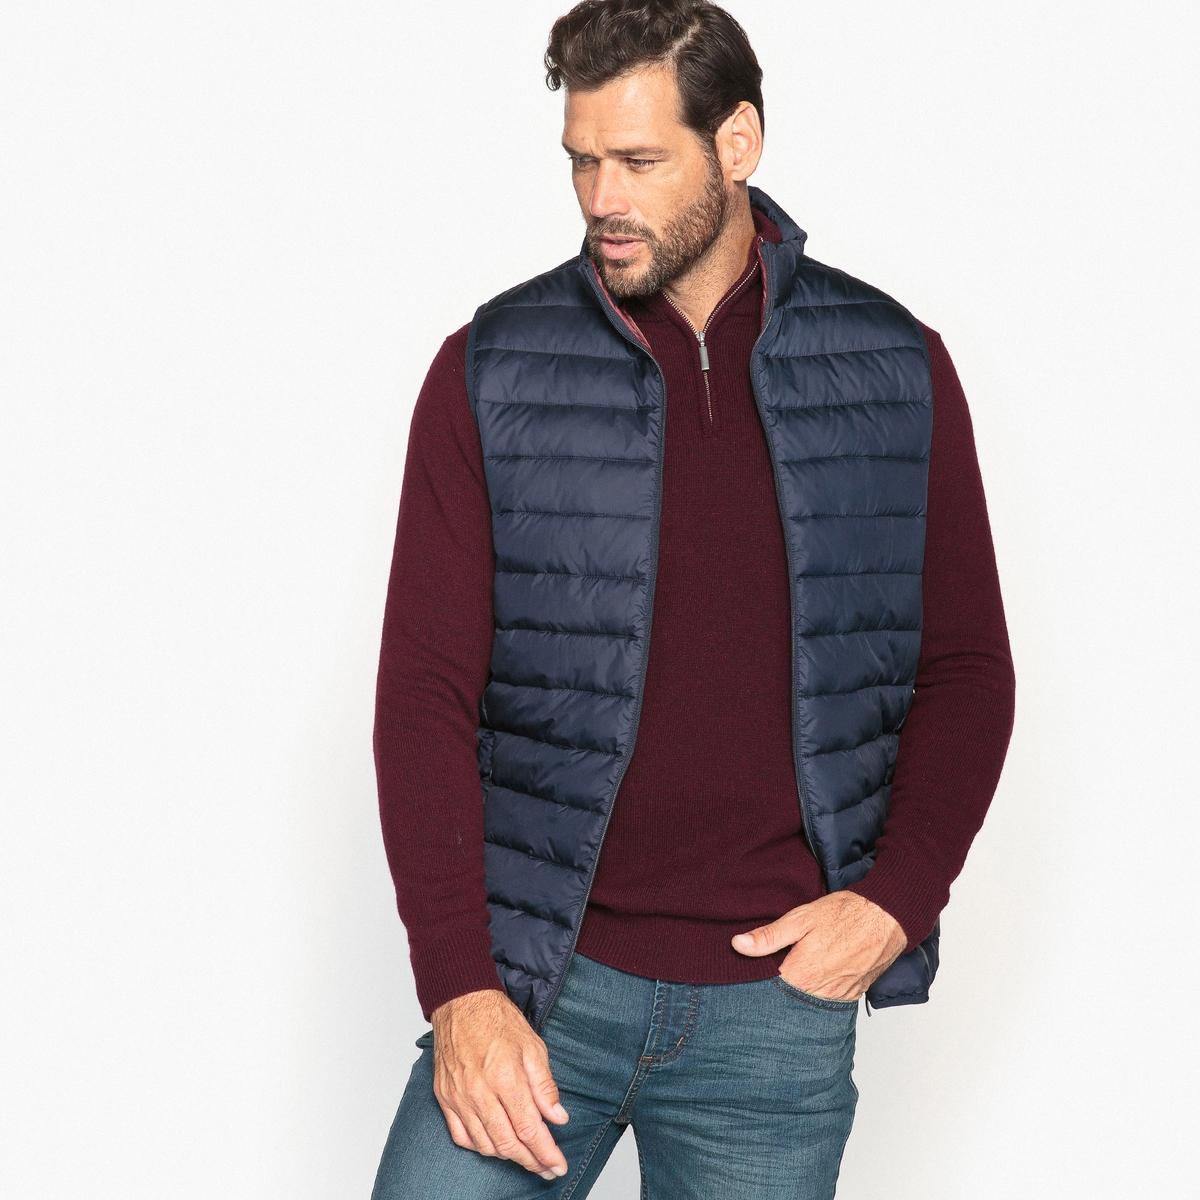 Kurzer Anorak| Plus-Size| Übergangszeit | Sportbekleidung > Sportmäntel | Blau | Polyester | CASTALUNA FOR MEN